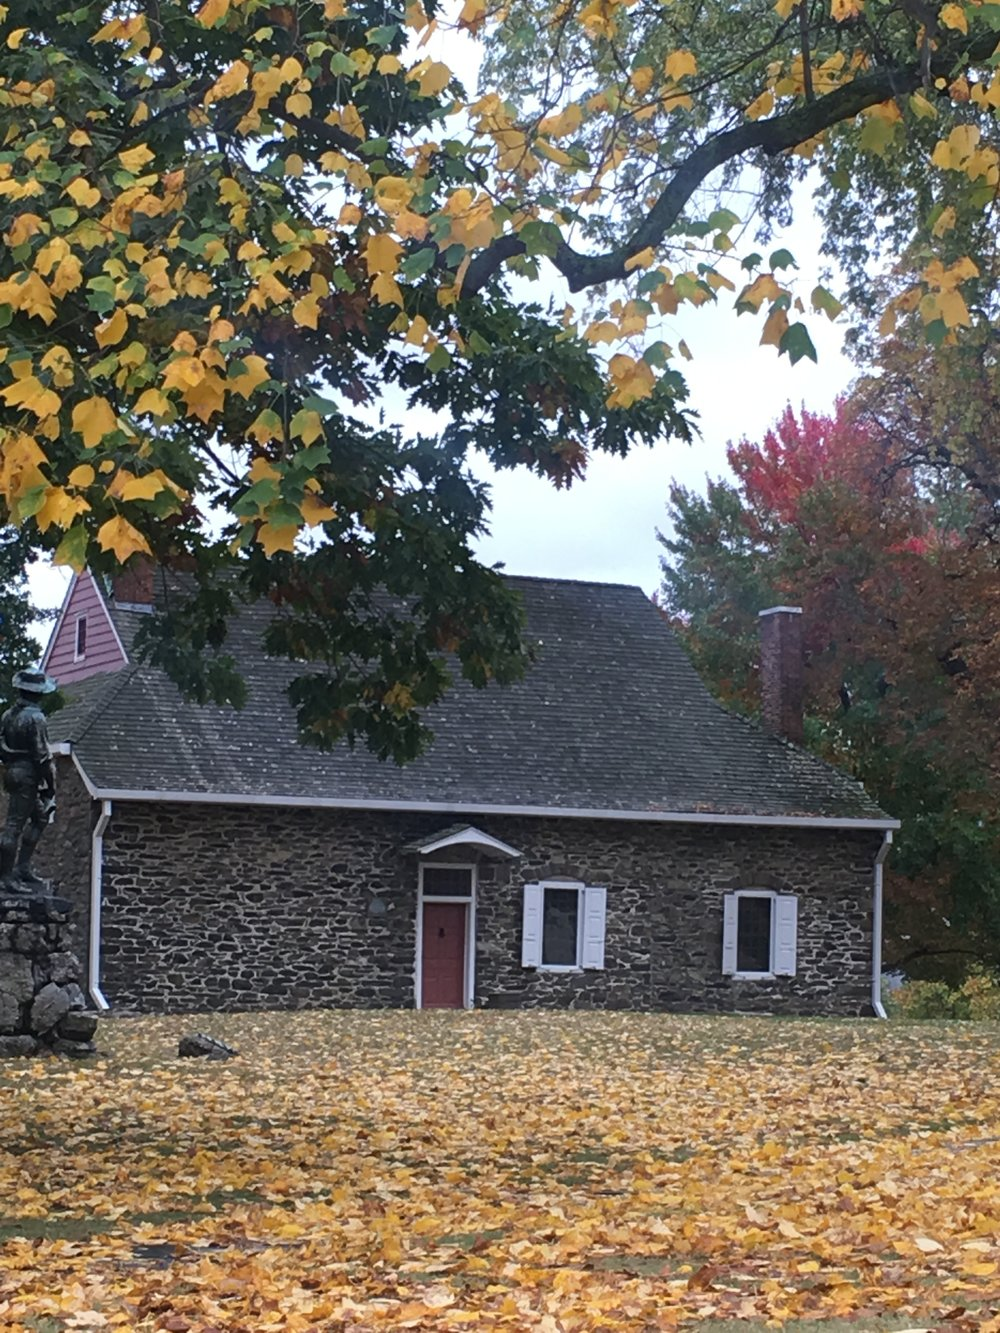 George and Martha lived here!